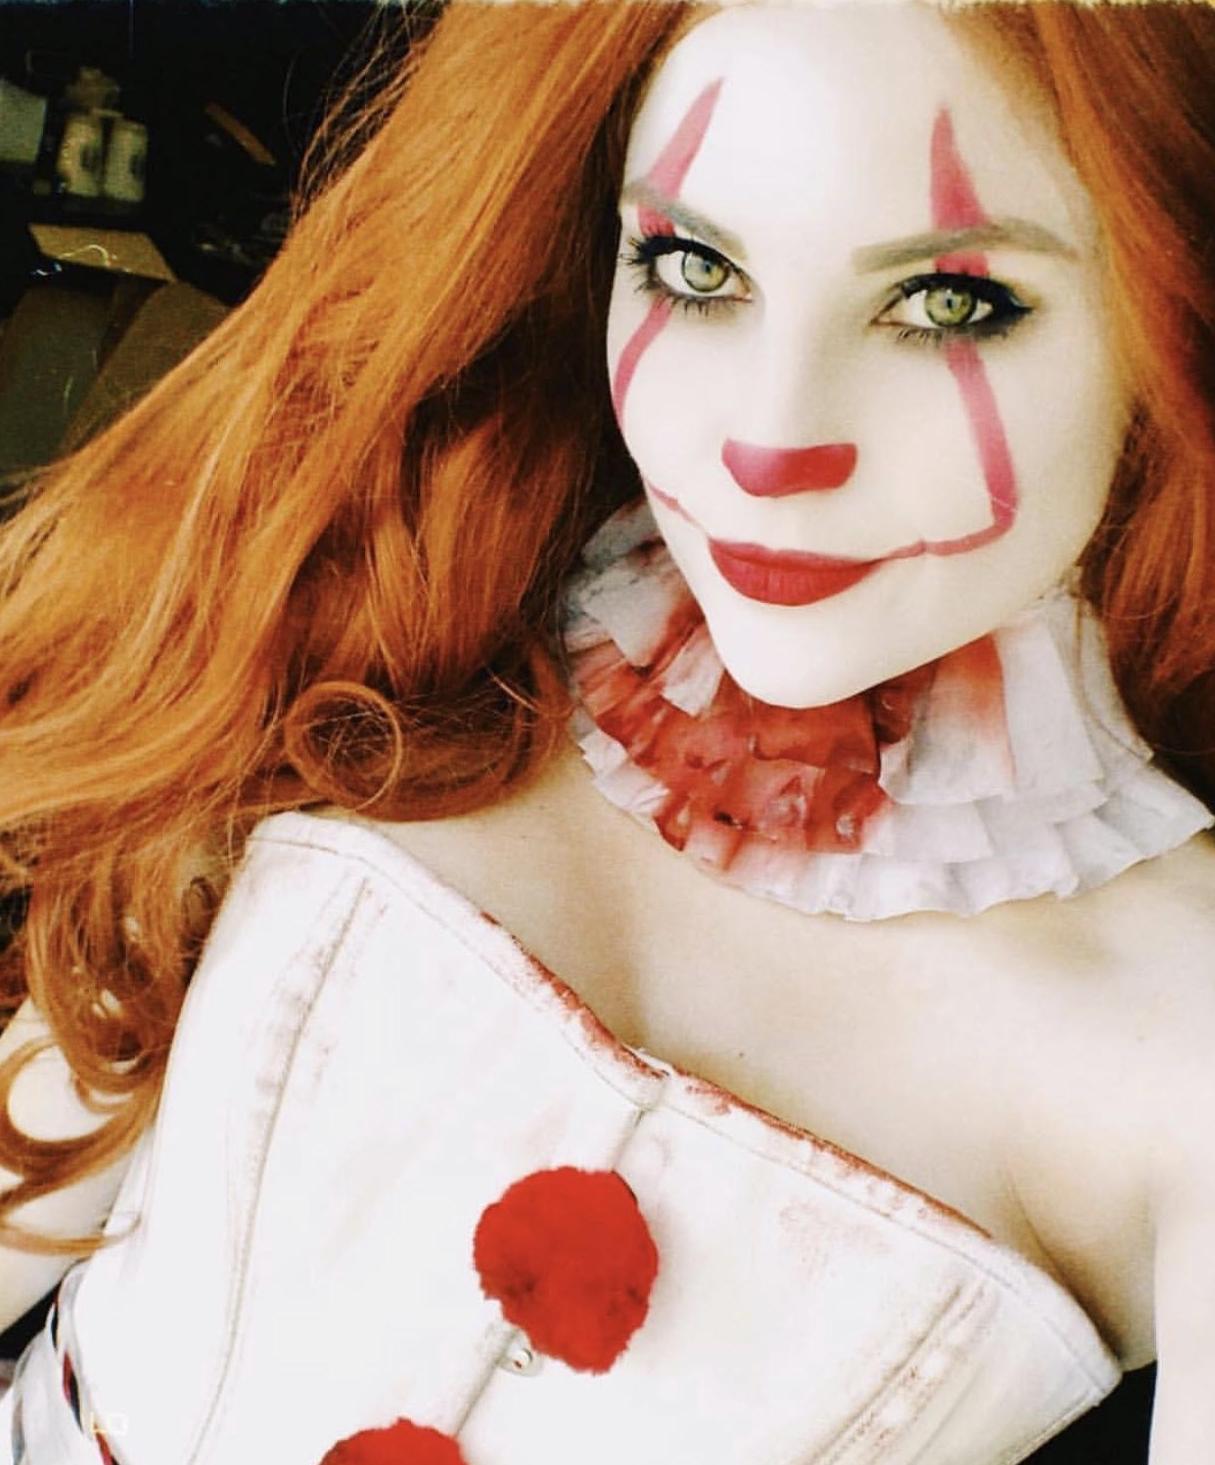 Scary Woman Clown.jpg